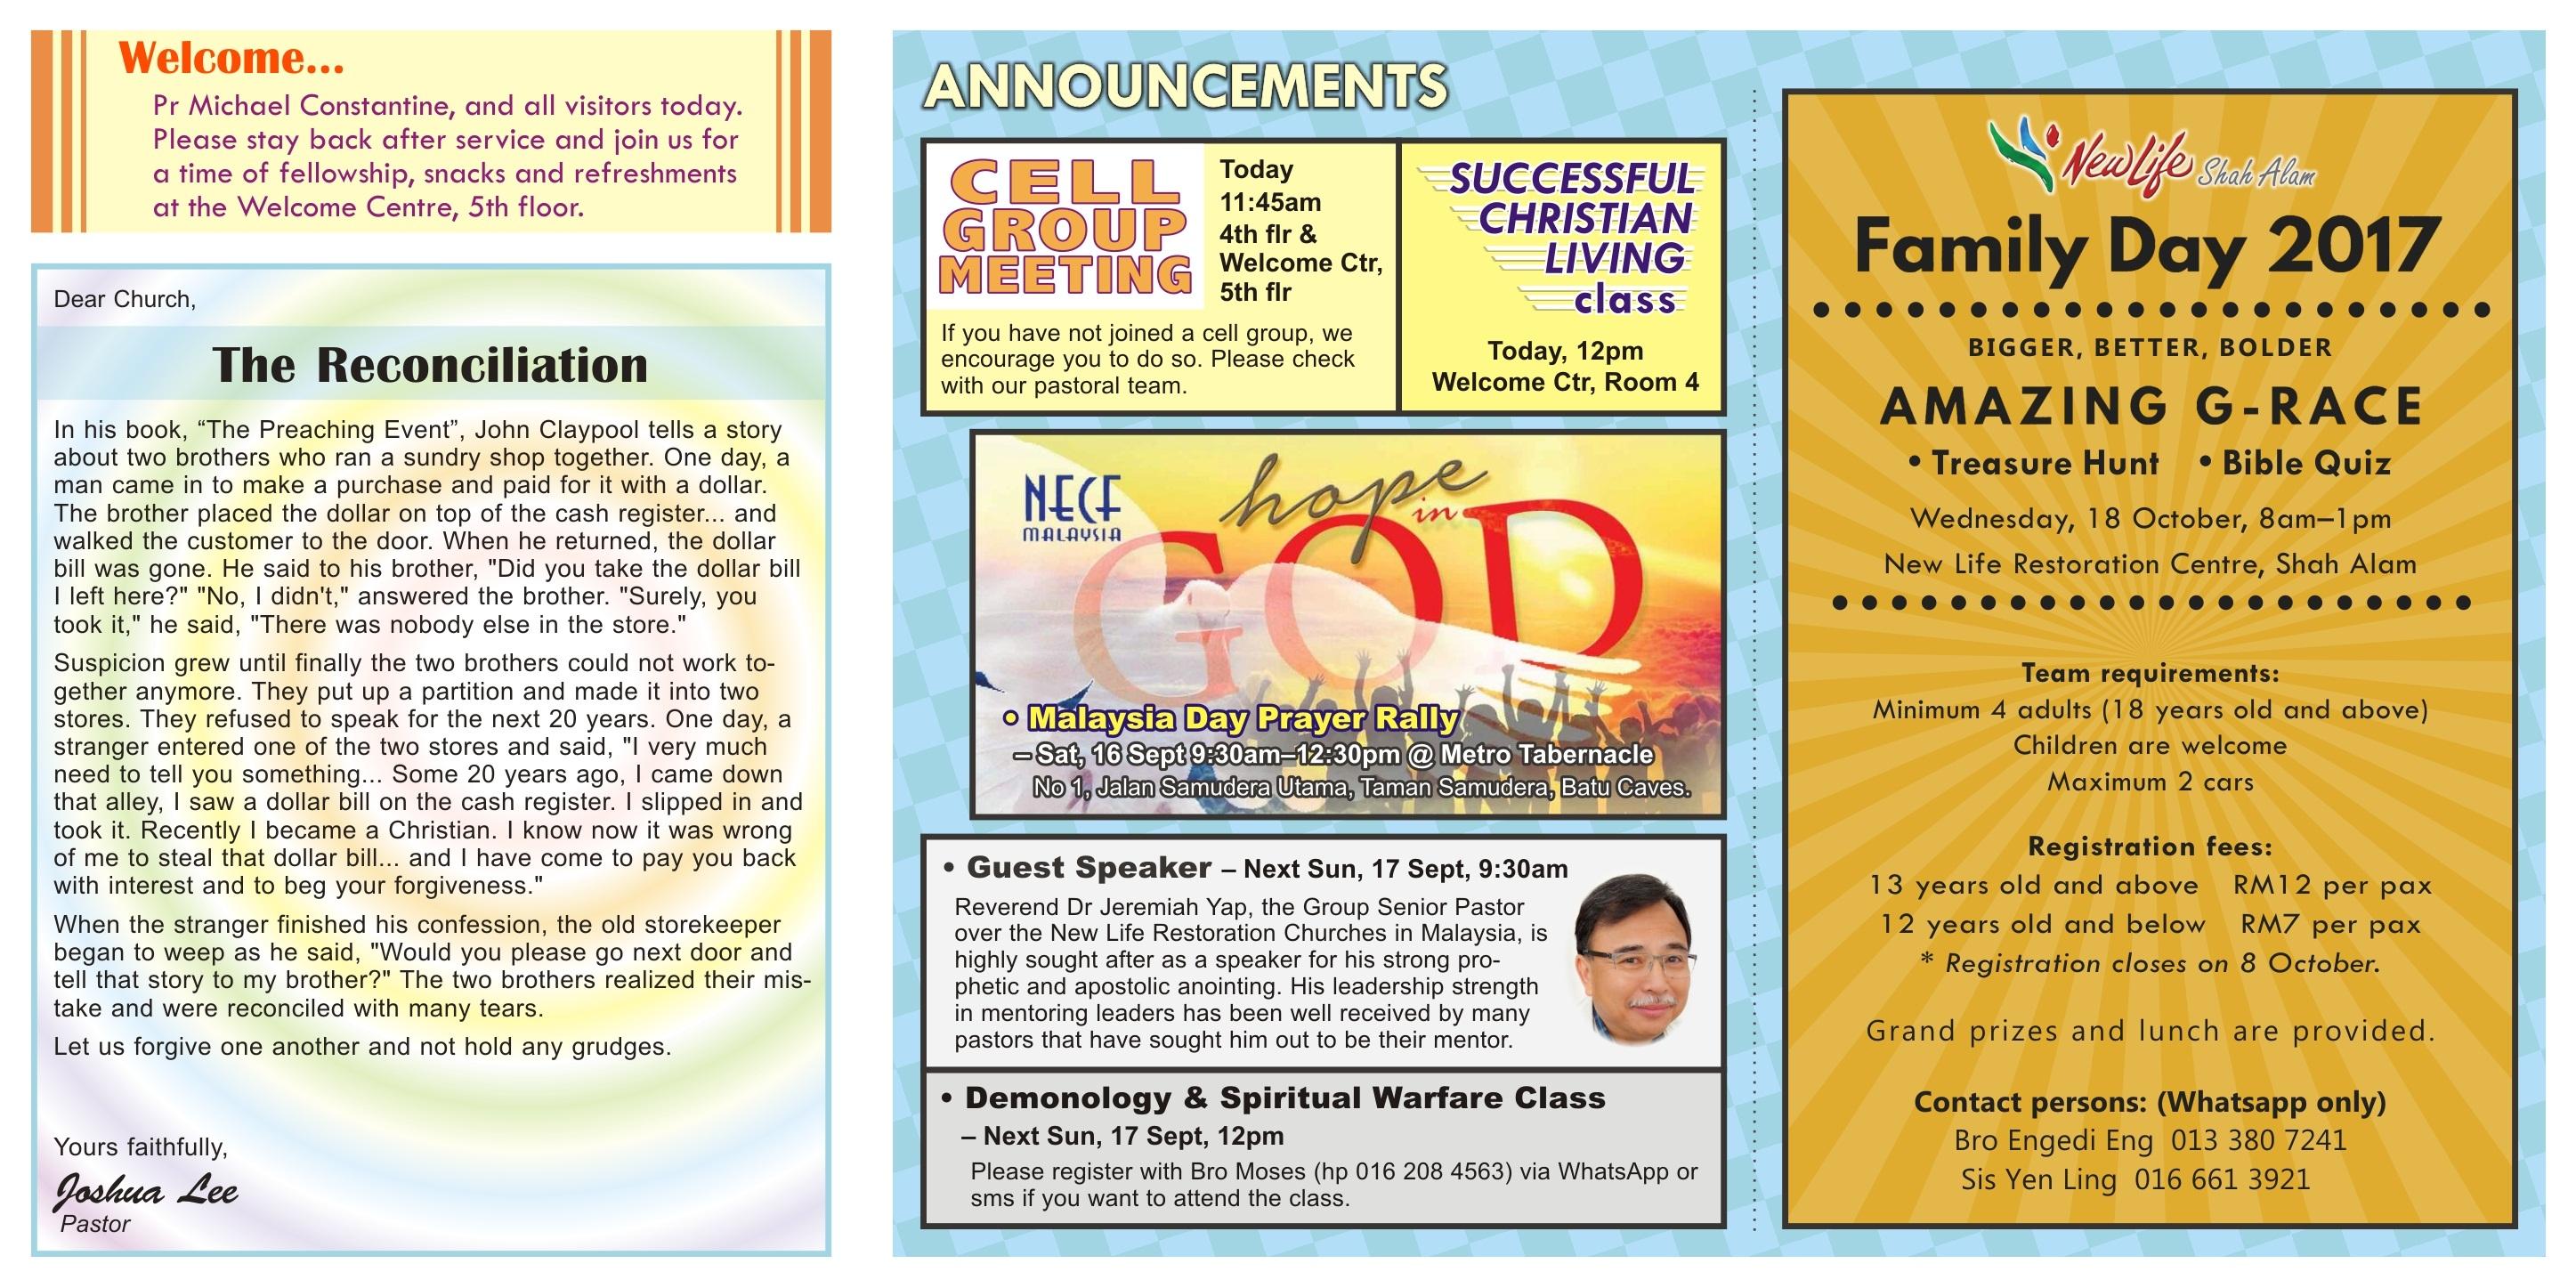 New Life Restoration Centre Shah Alam Bulletin 10th September 2017